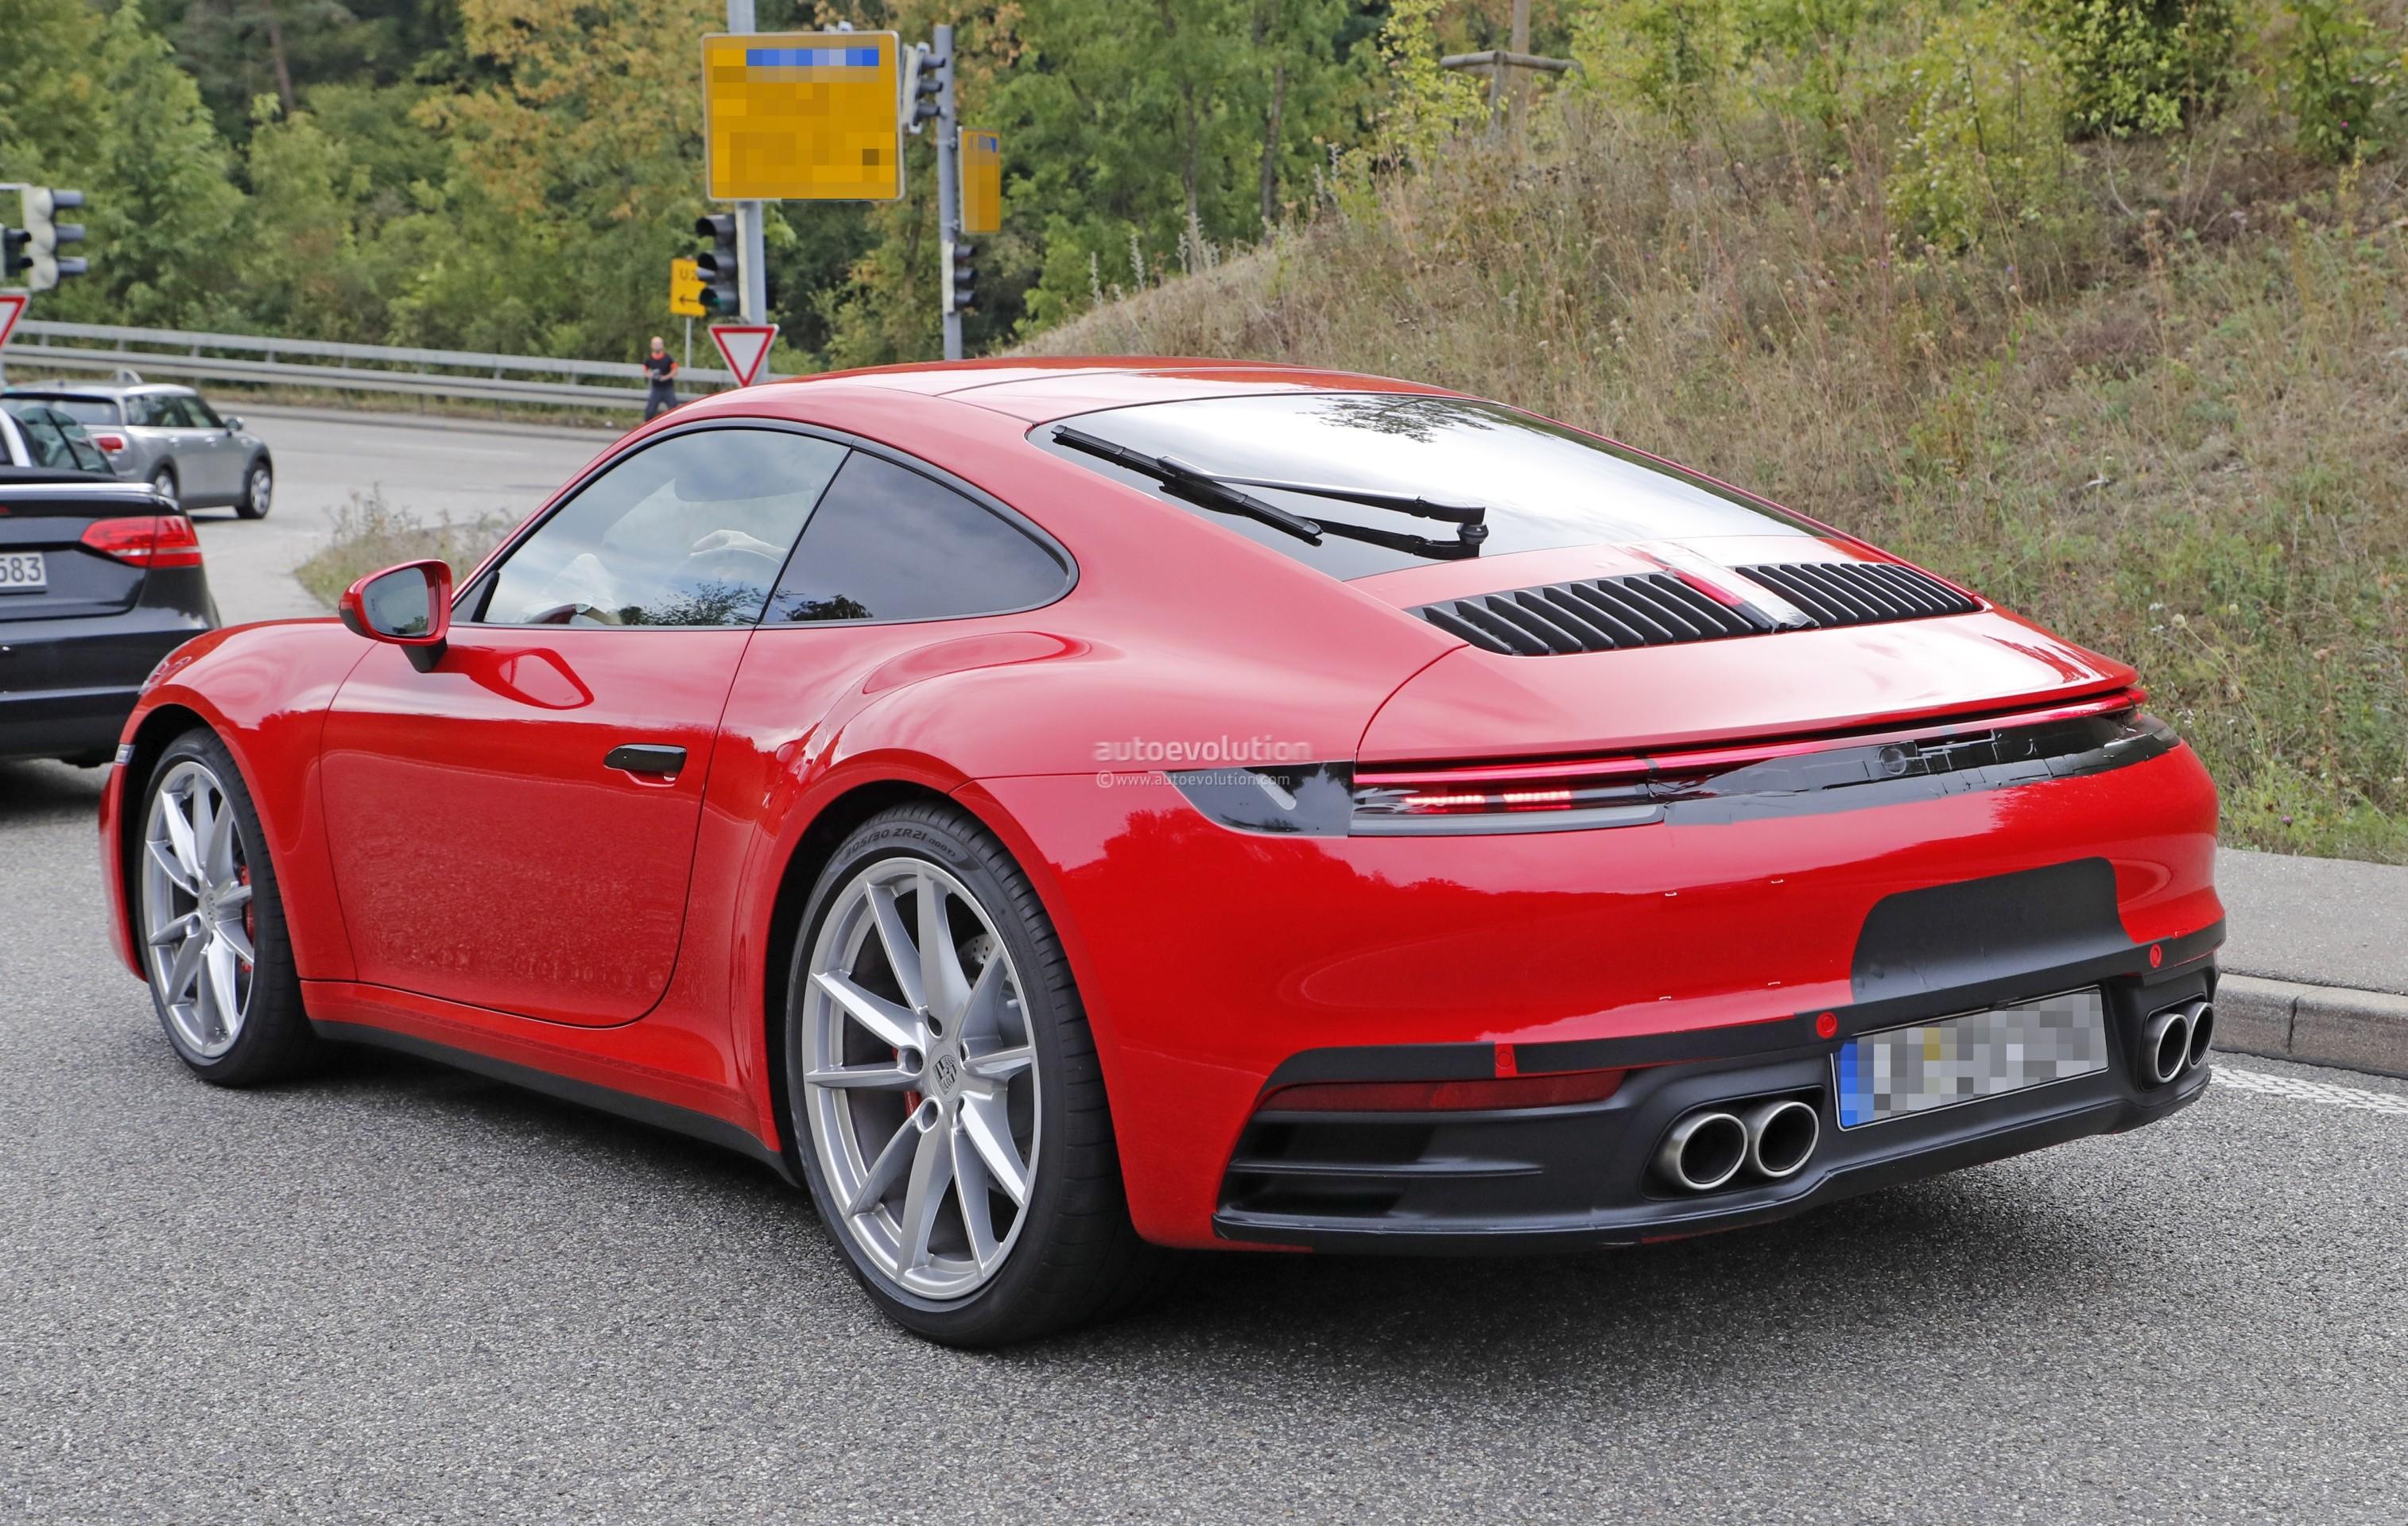 911 Targa 4S >> 2020 Porsche 911 Looks Like a Modern 993 - autoevolution